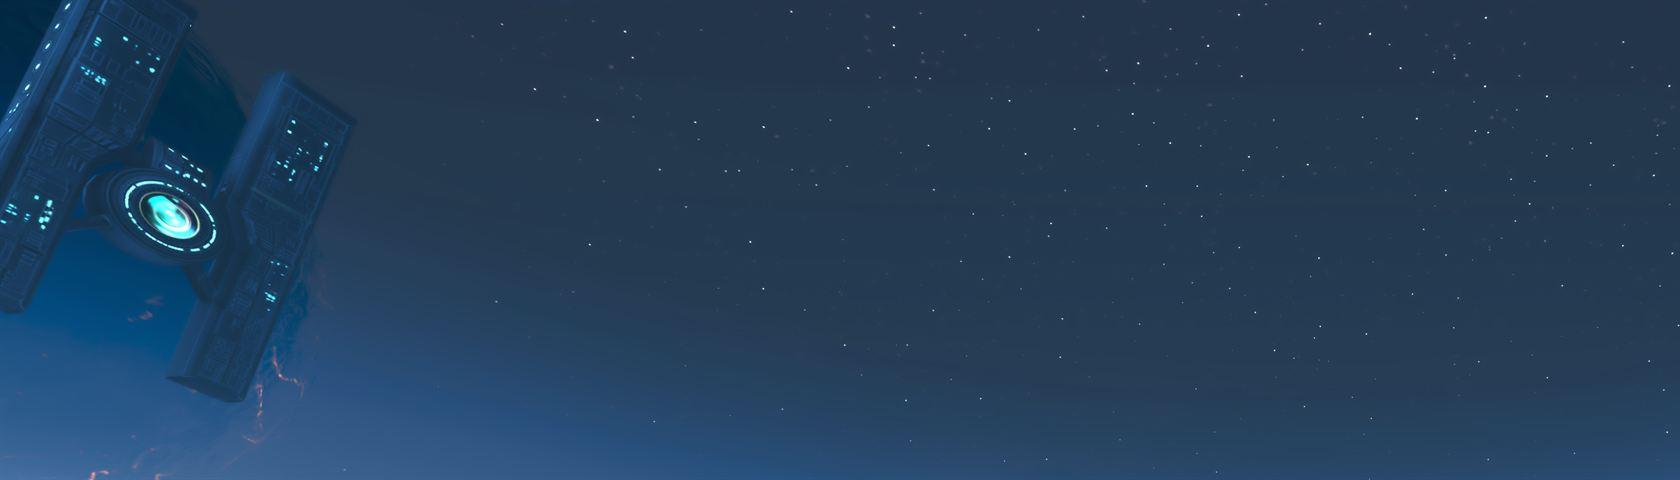 Borderlands 2 - Hyperion Station at Night